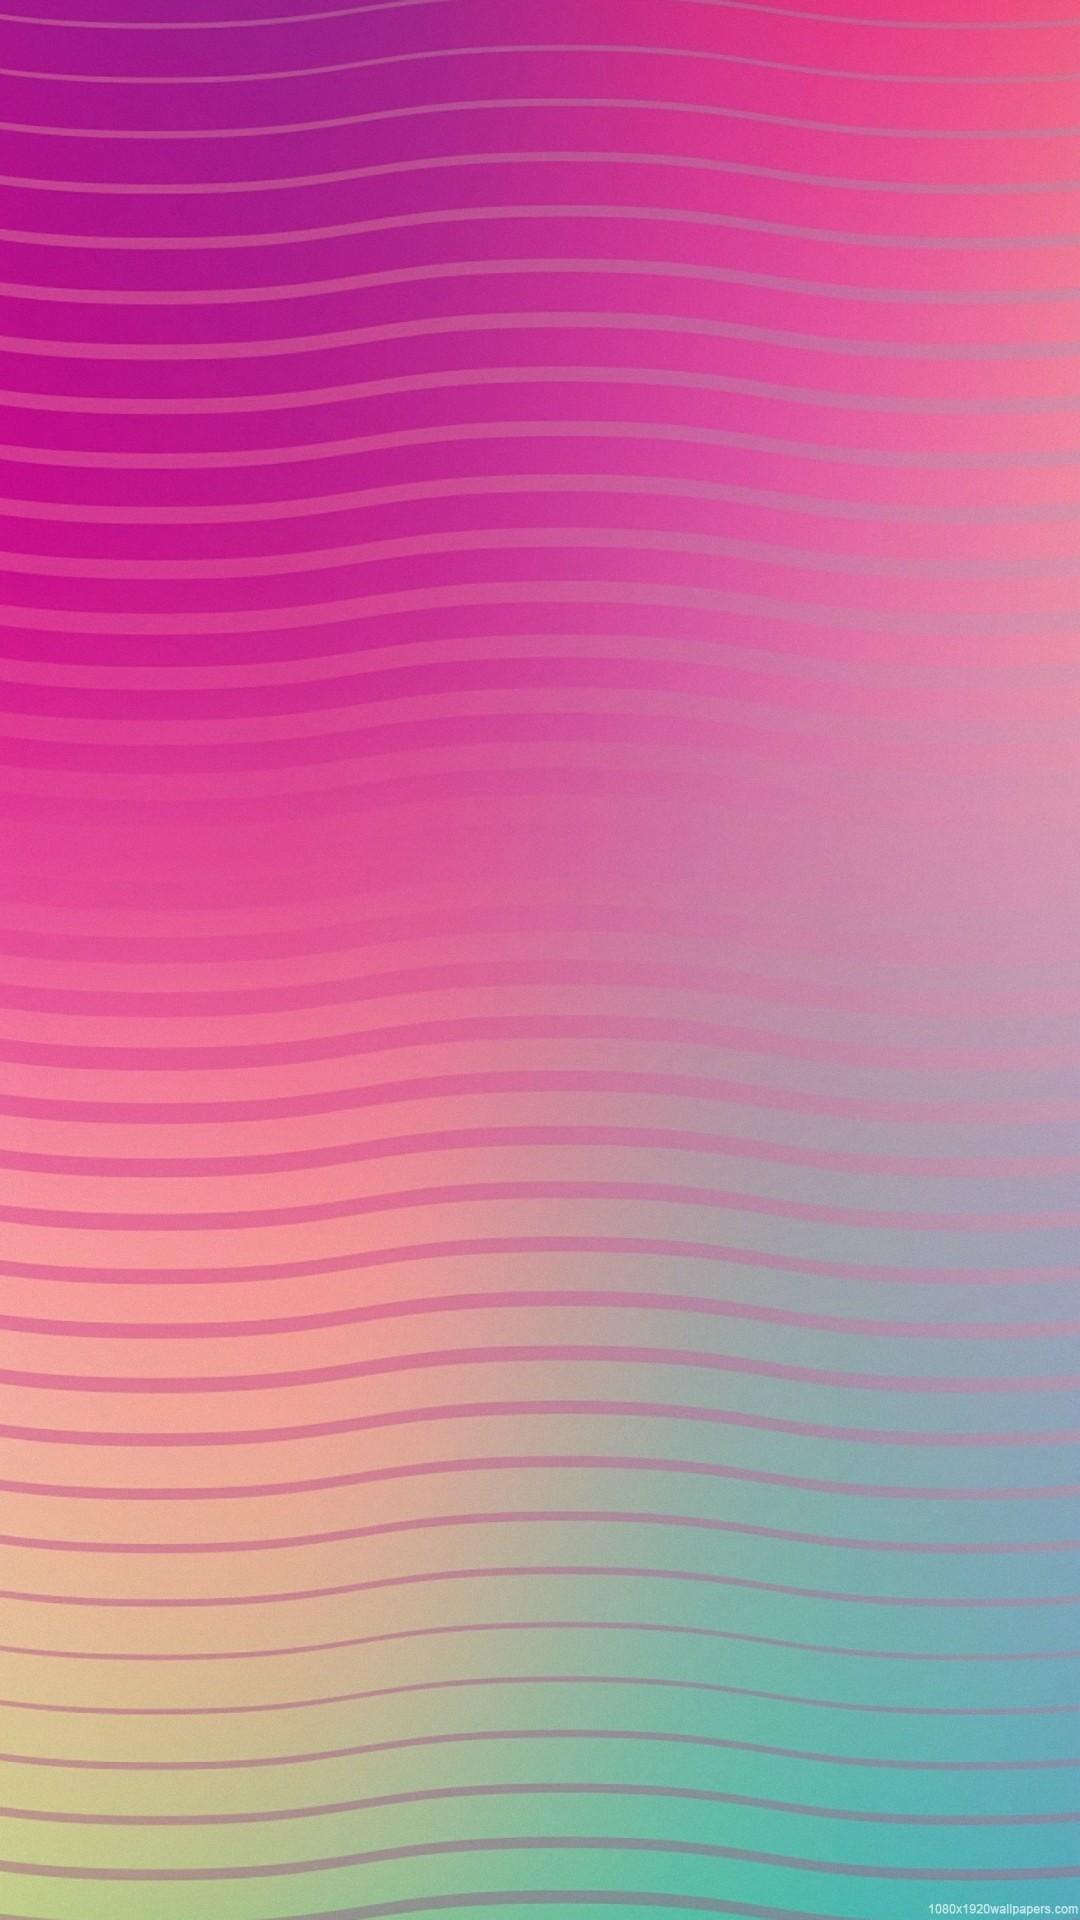 Ombre iPhone wallpaper